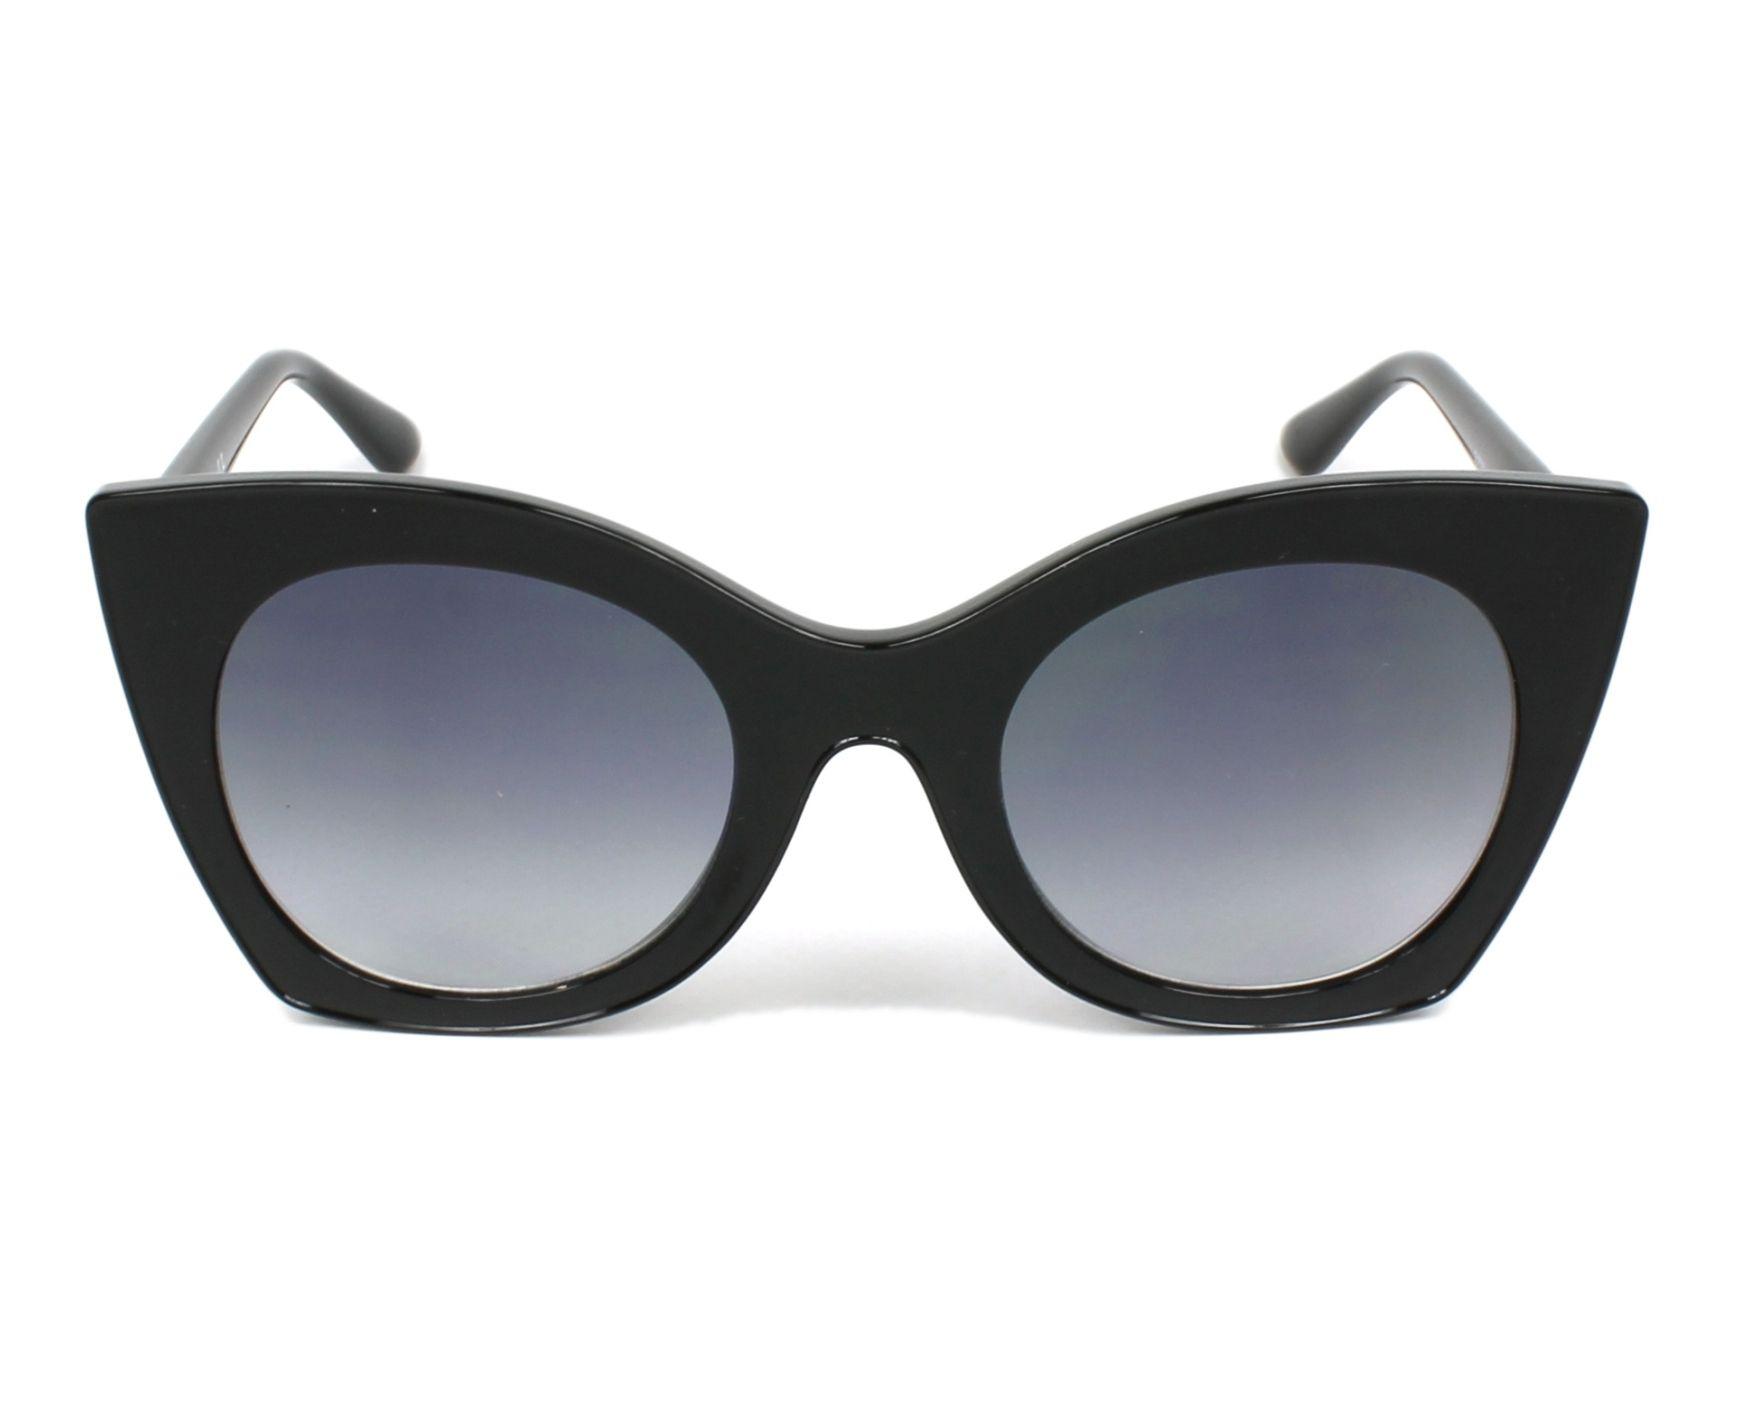 3dc2cdc981465 Sunglasses Guess GU-7525 01B 51-23 Black front view